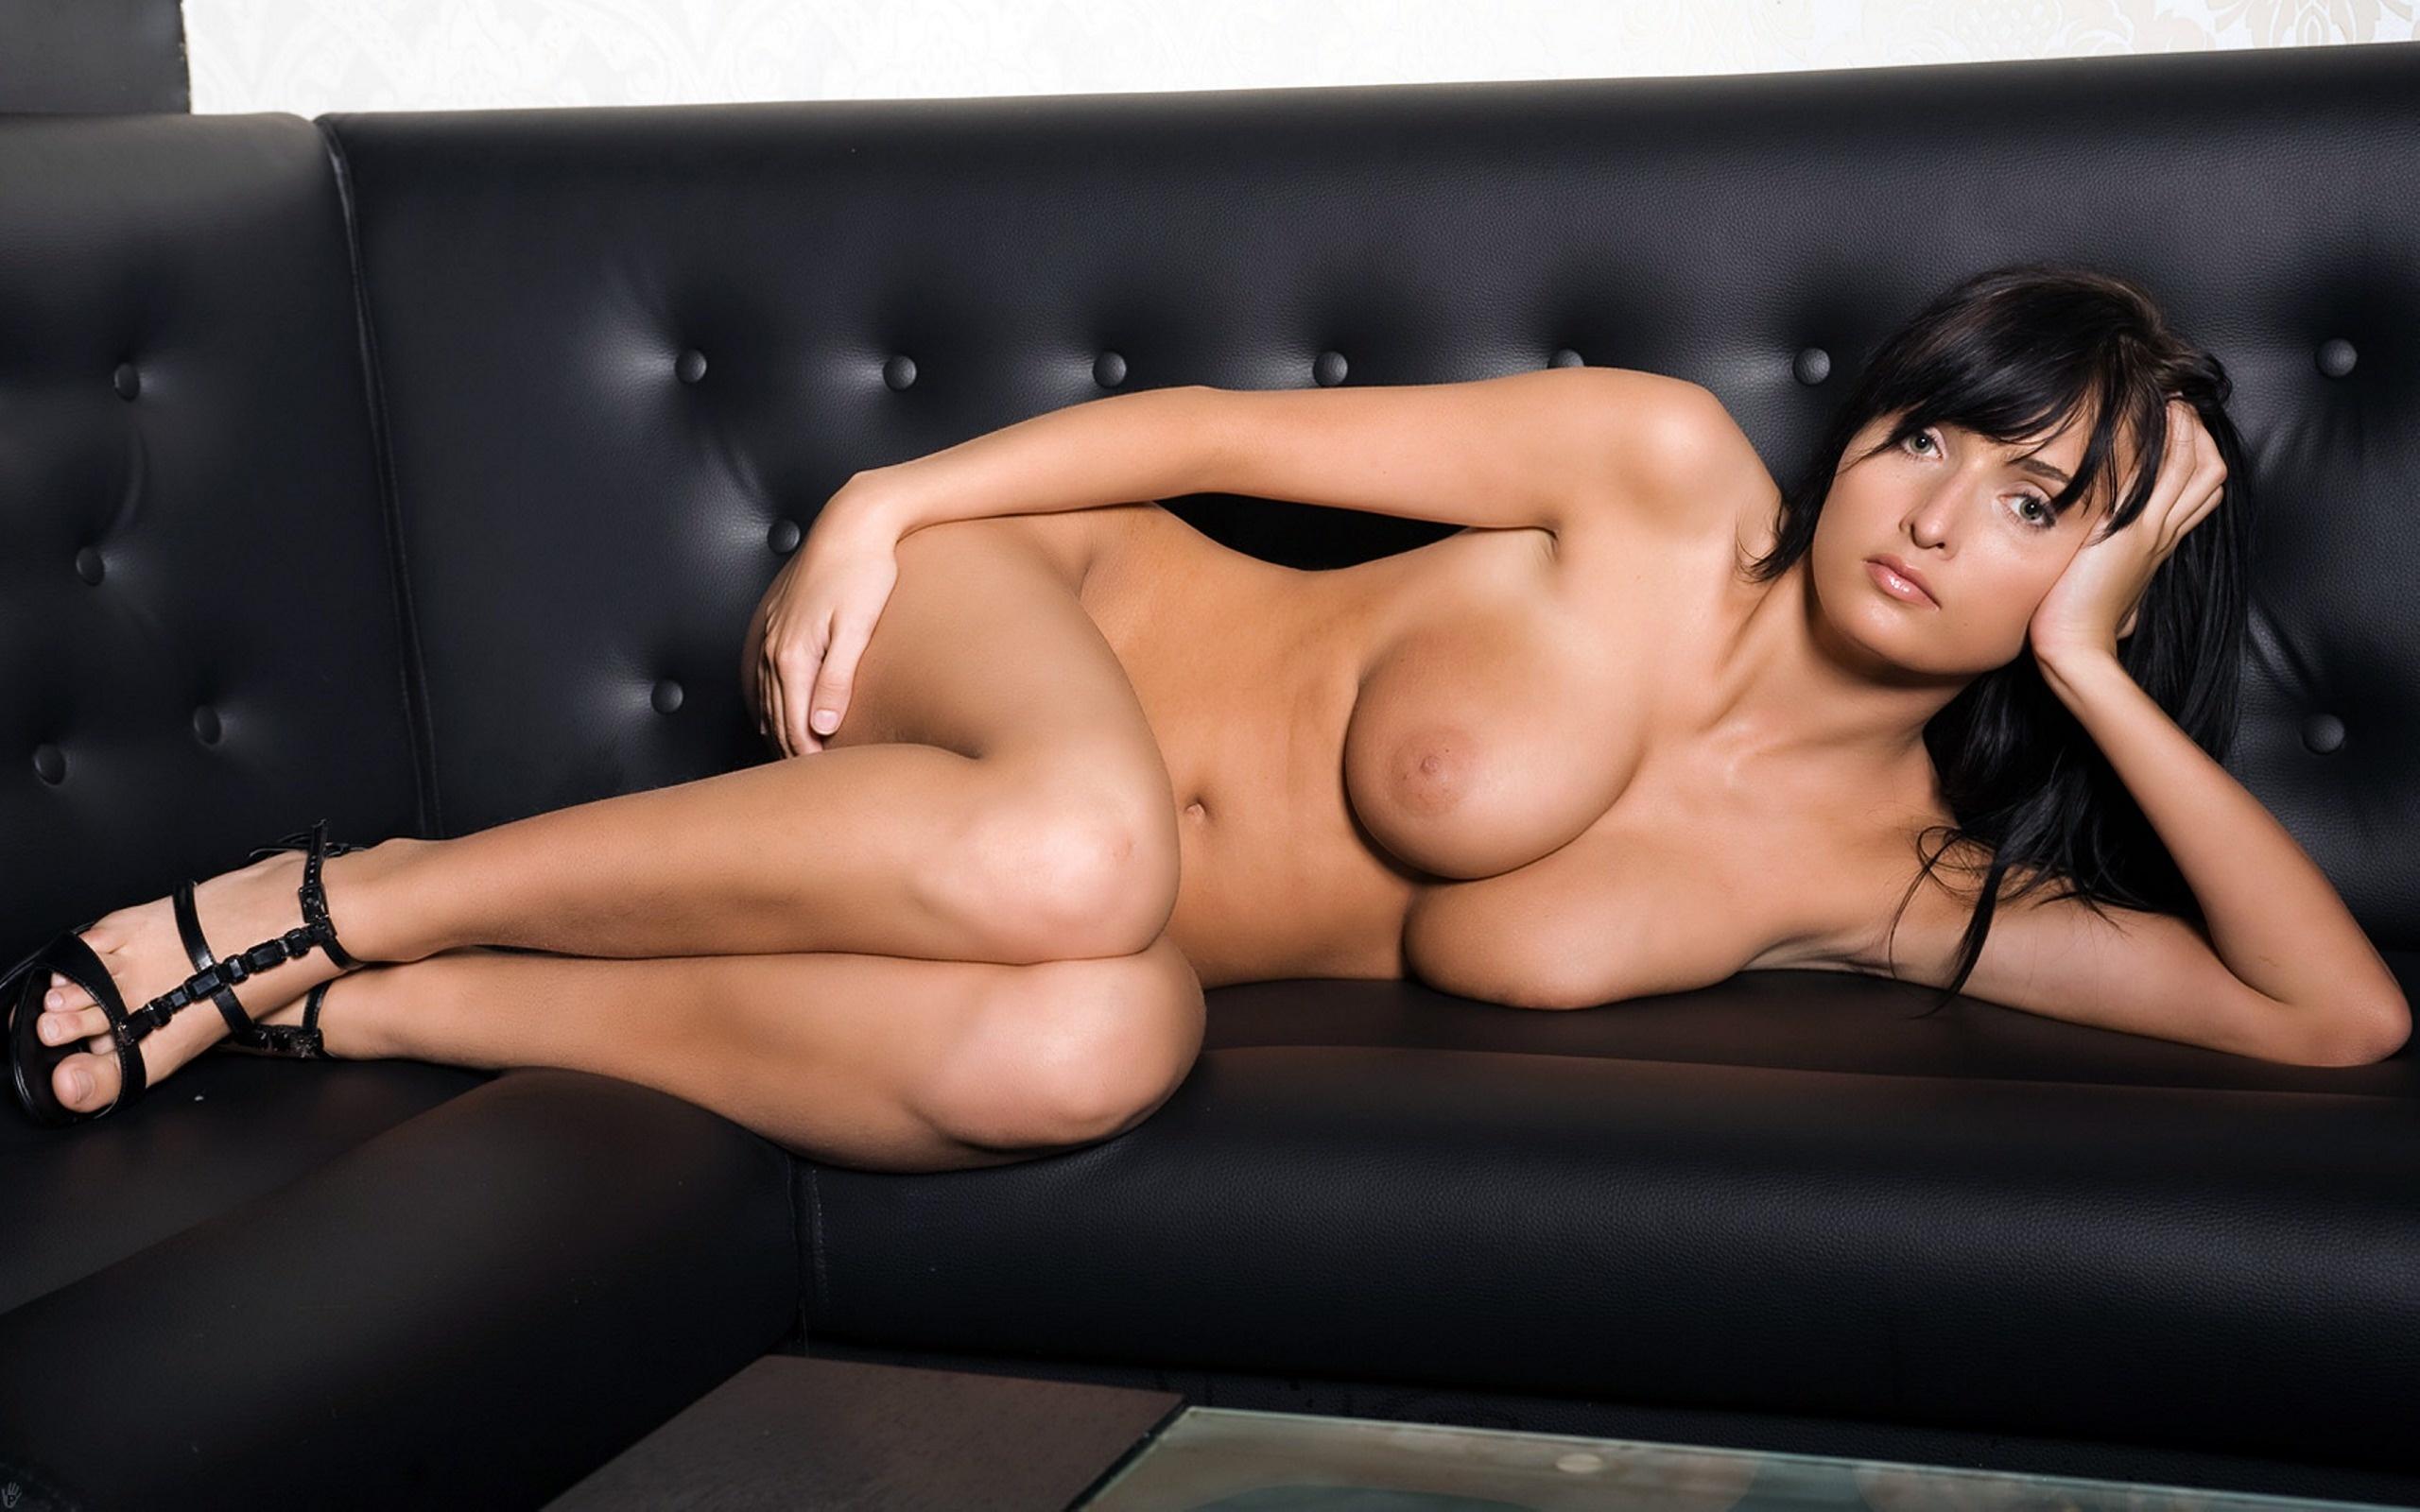 Naga sexy solo pix sexy gallery